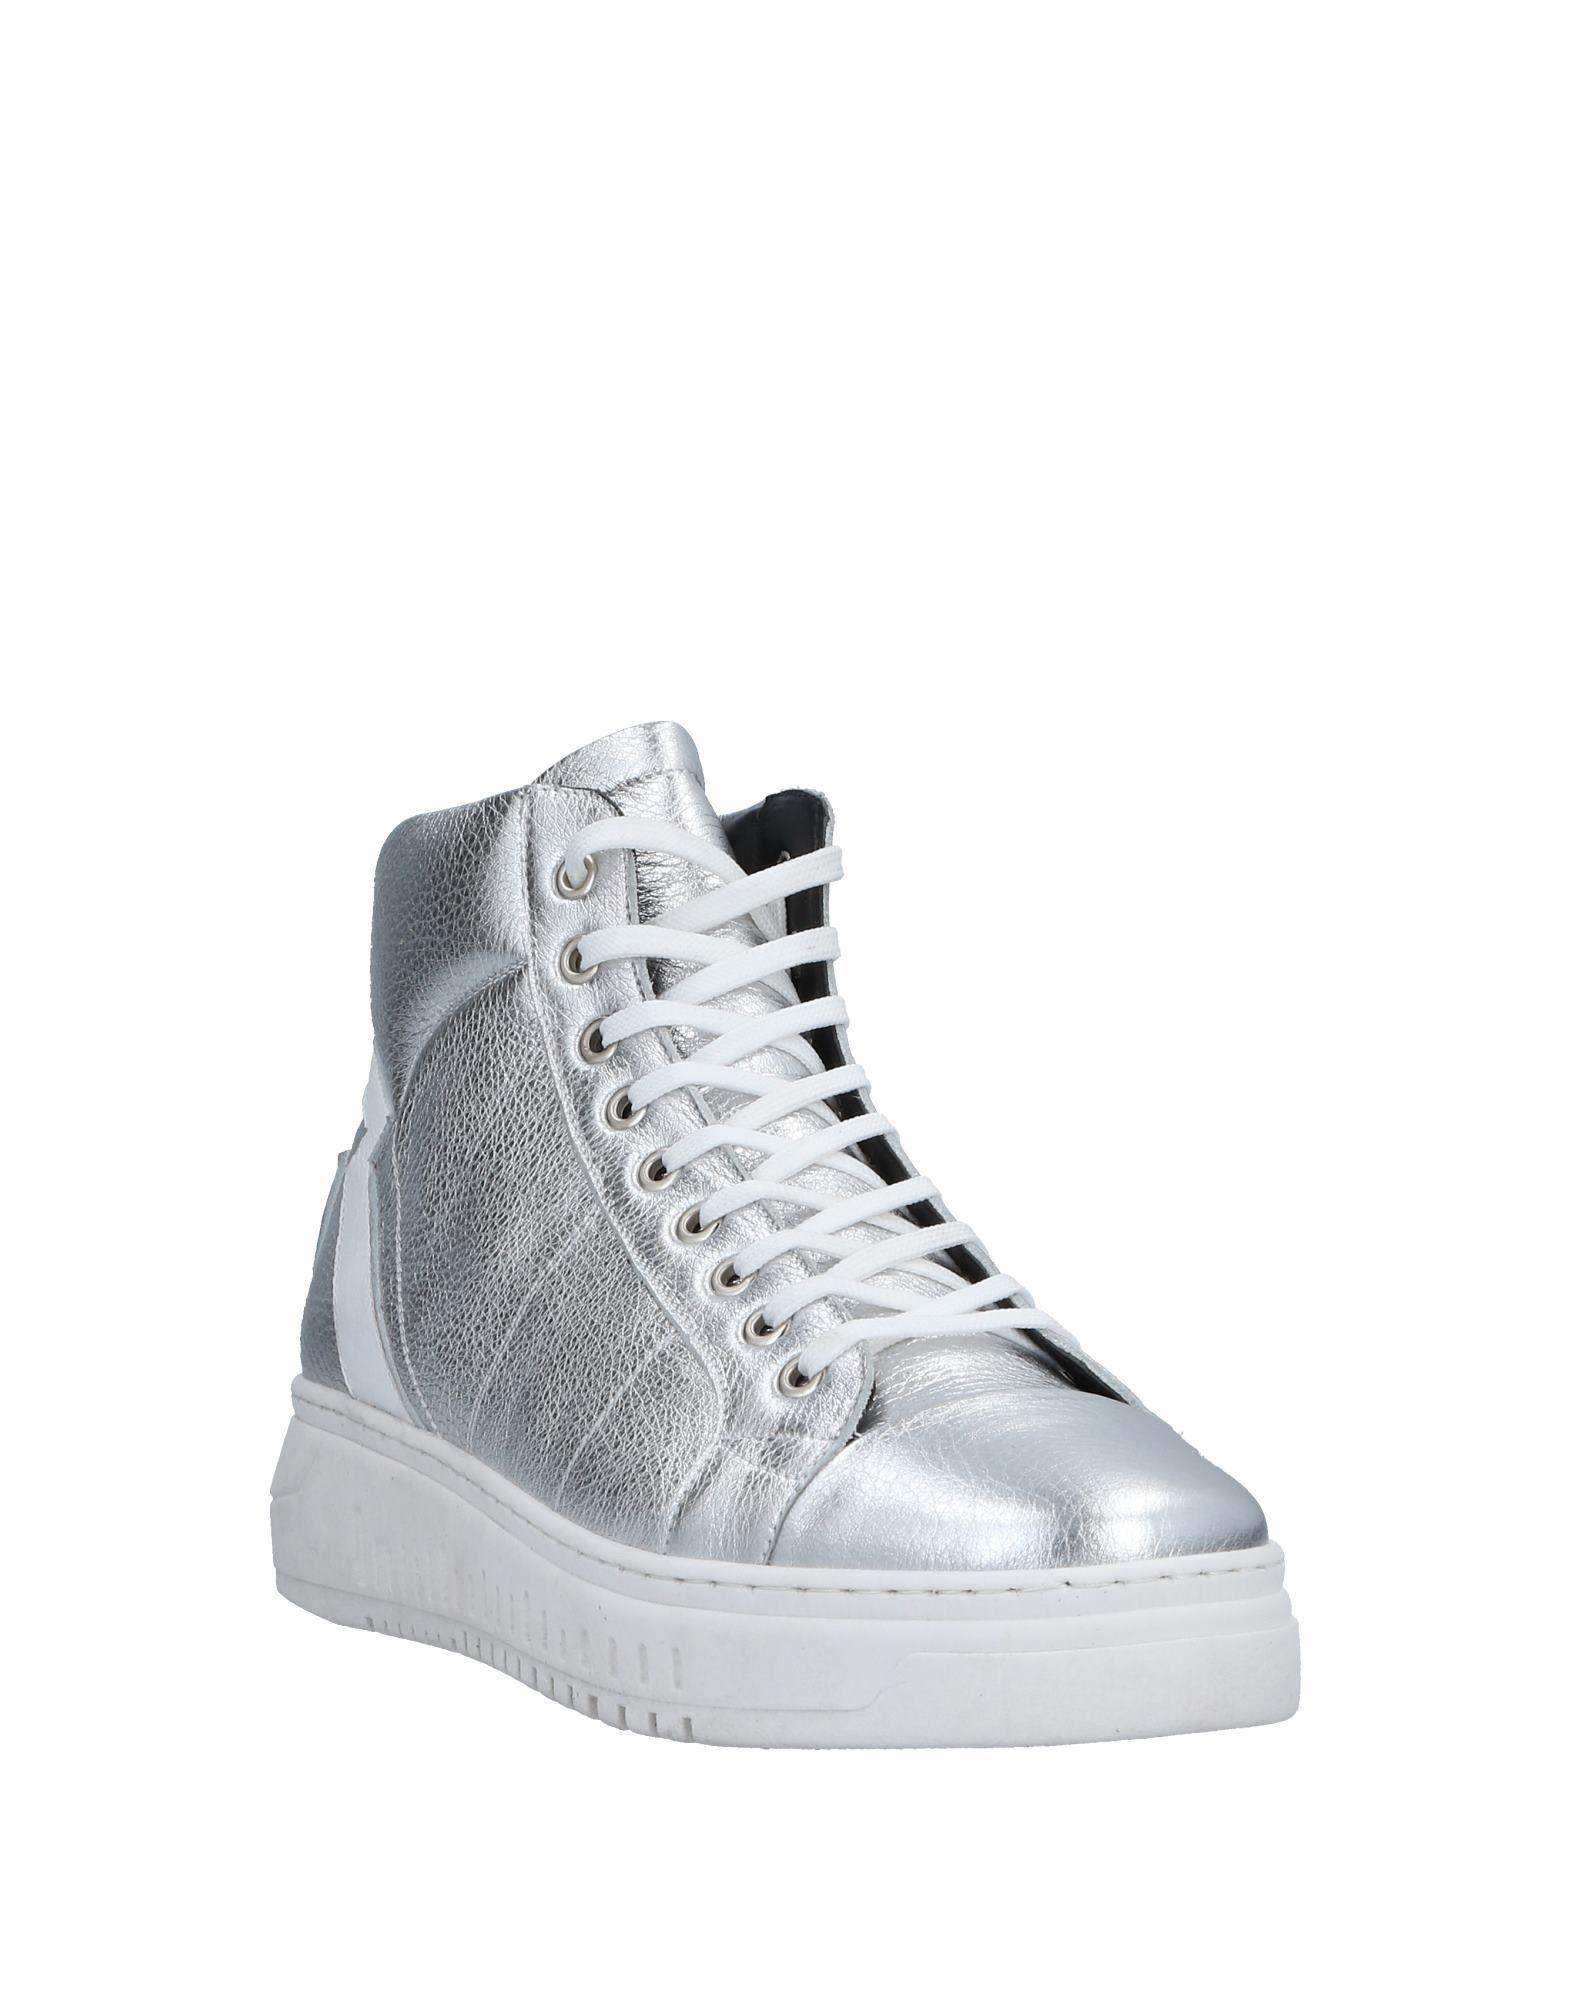 Rabatt echte Schuhe Savio Barbato Sneakers Herren  11535403JT